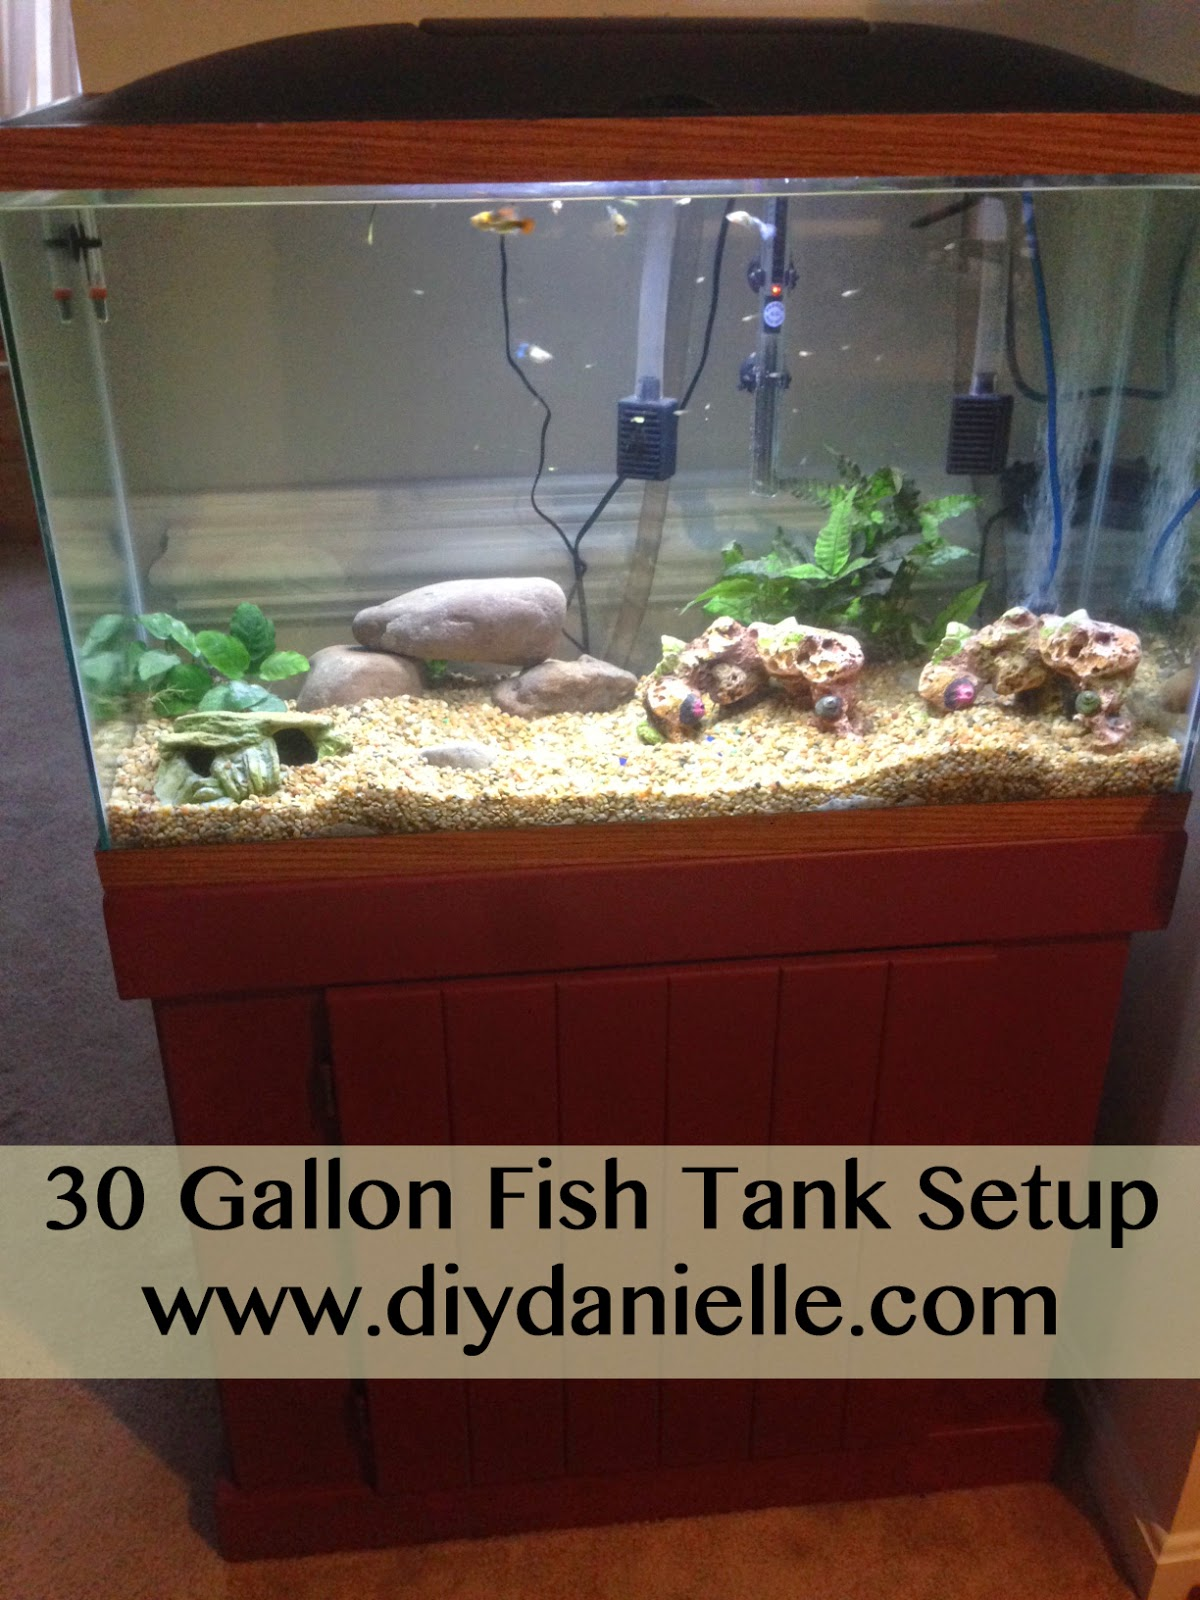 30 Gallon Fish Tank Setup DIY Danielle